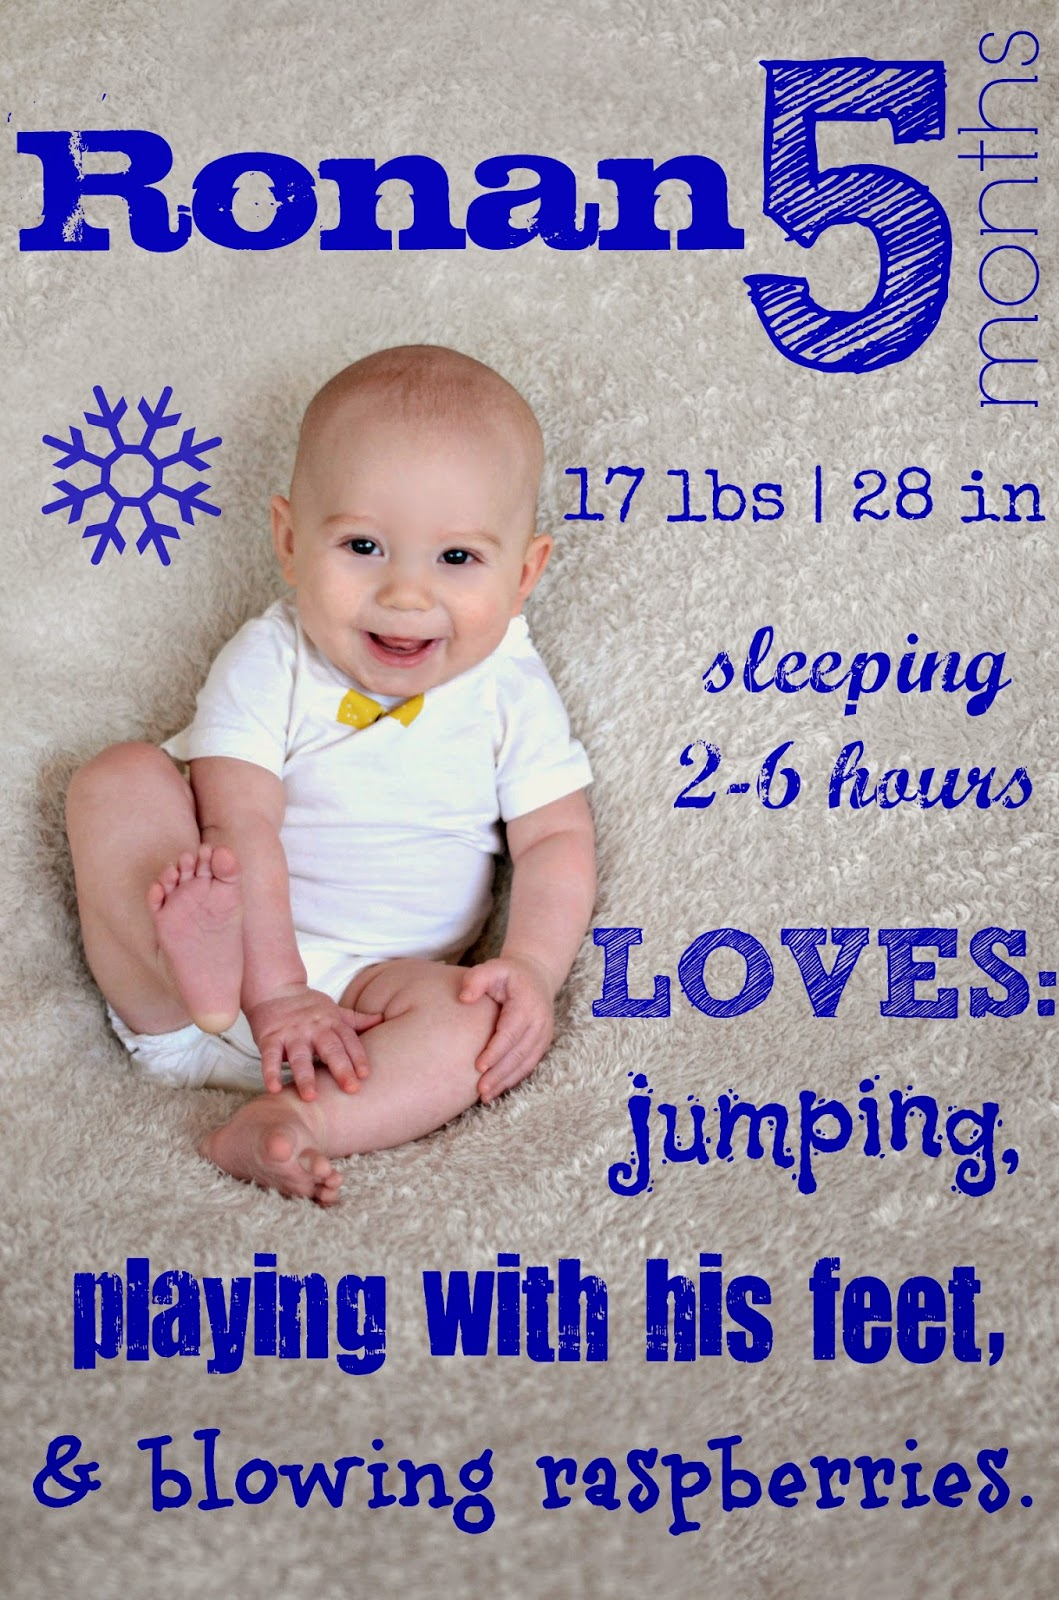 love jenny xoxo: Ronan is 5 months old!